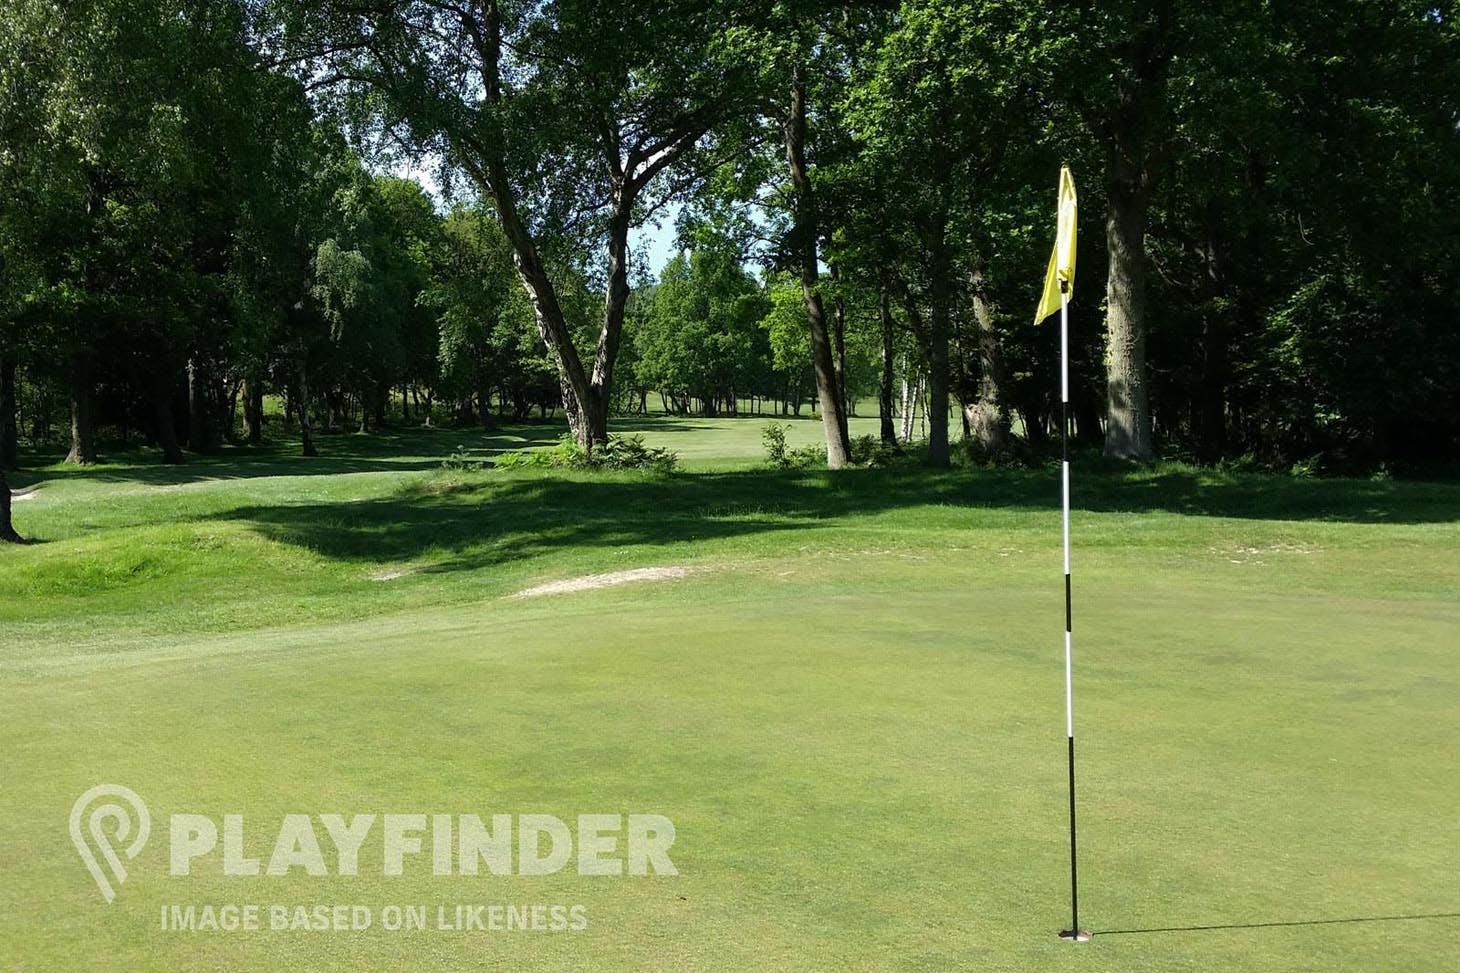 Edmonton Leisure Centre 9 hole golf course